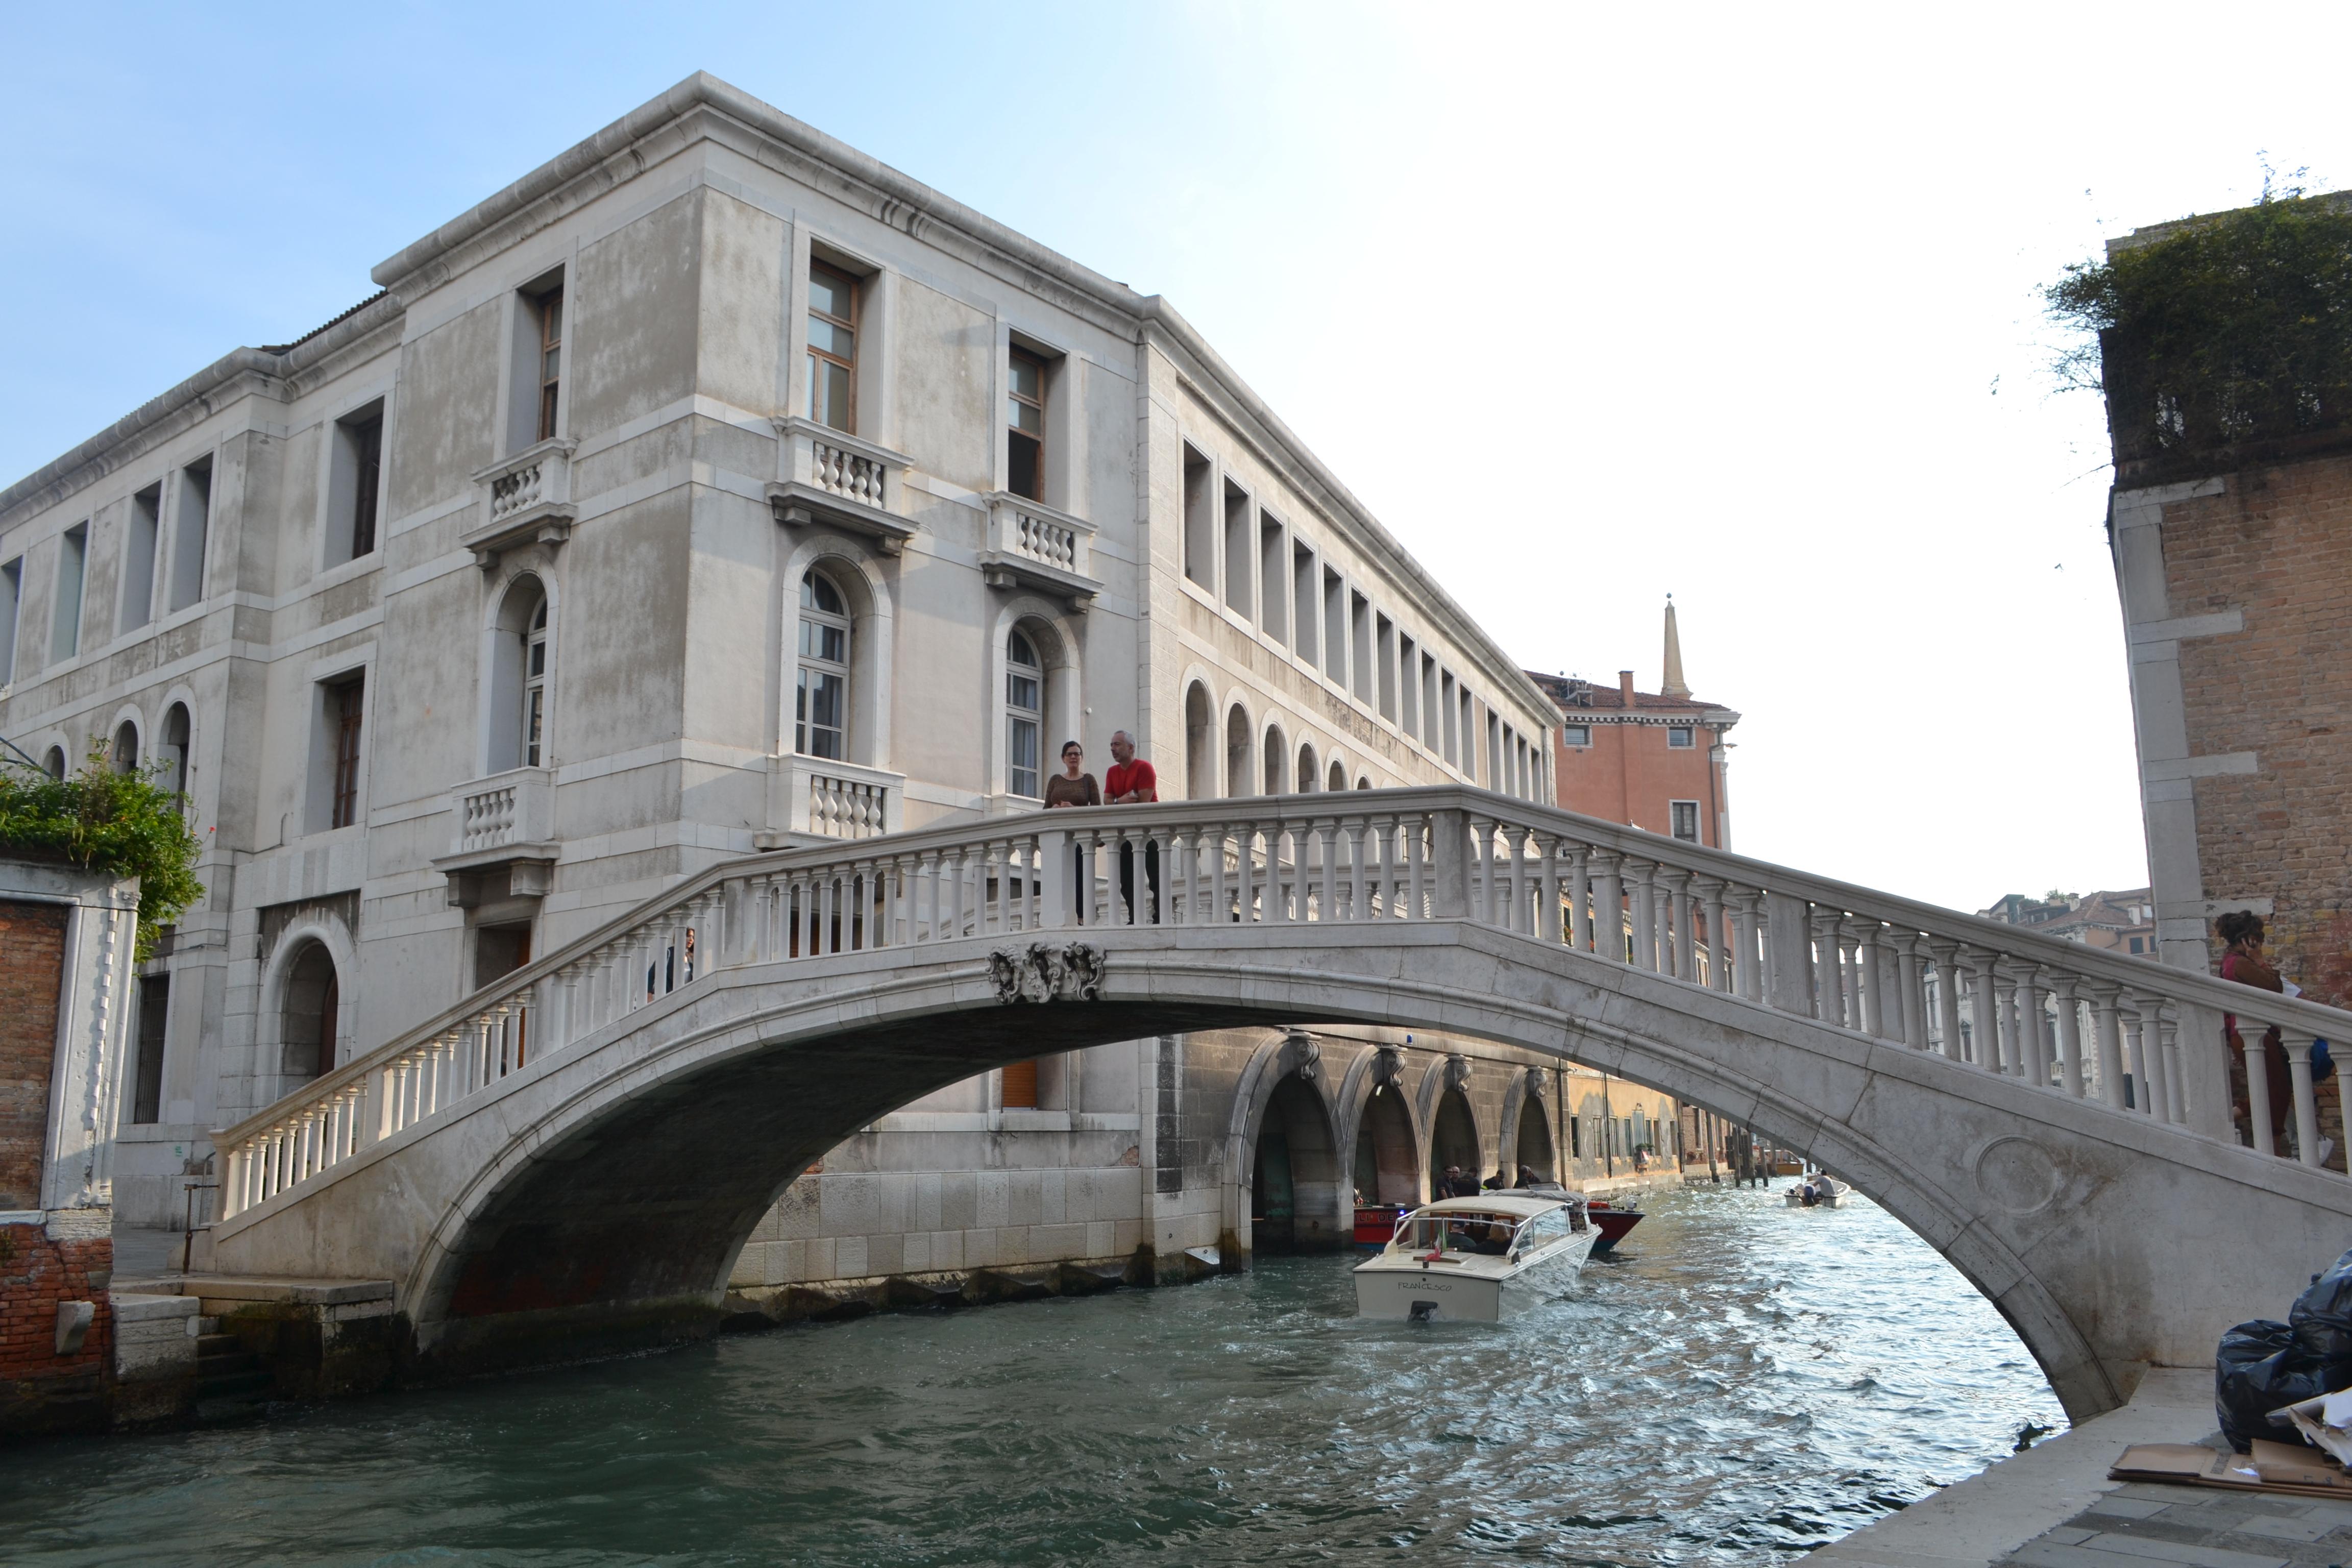 bridge-dsc_0244